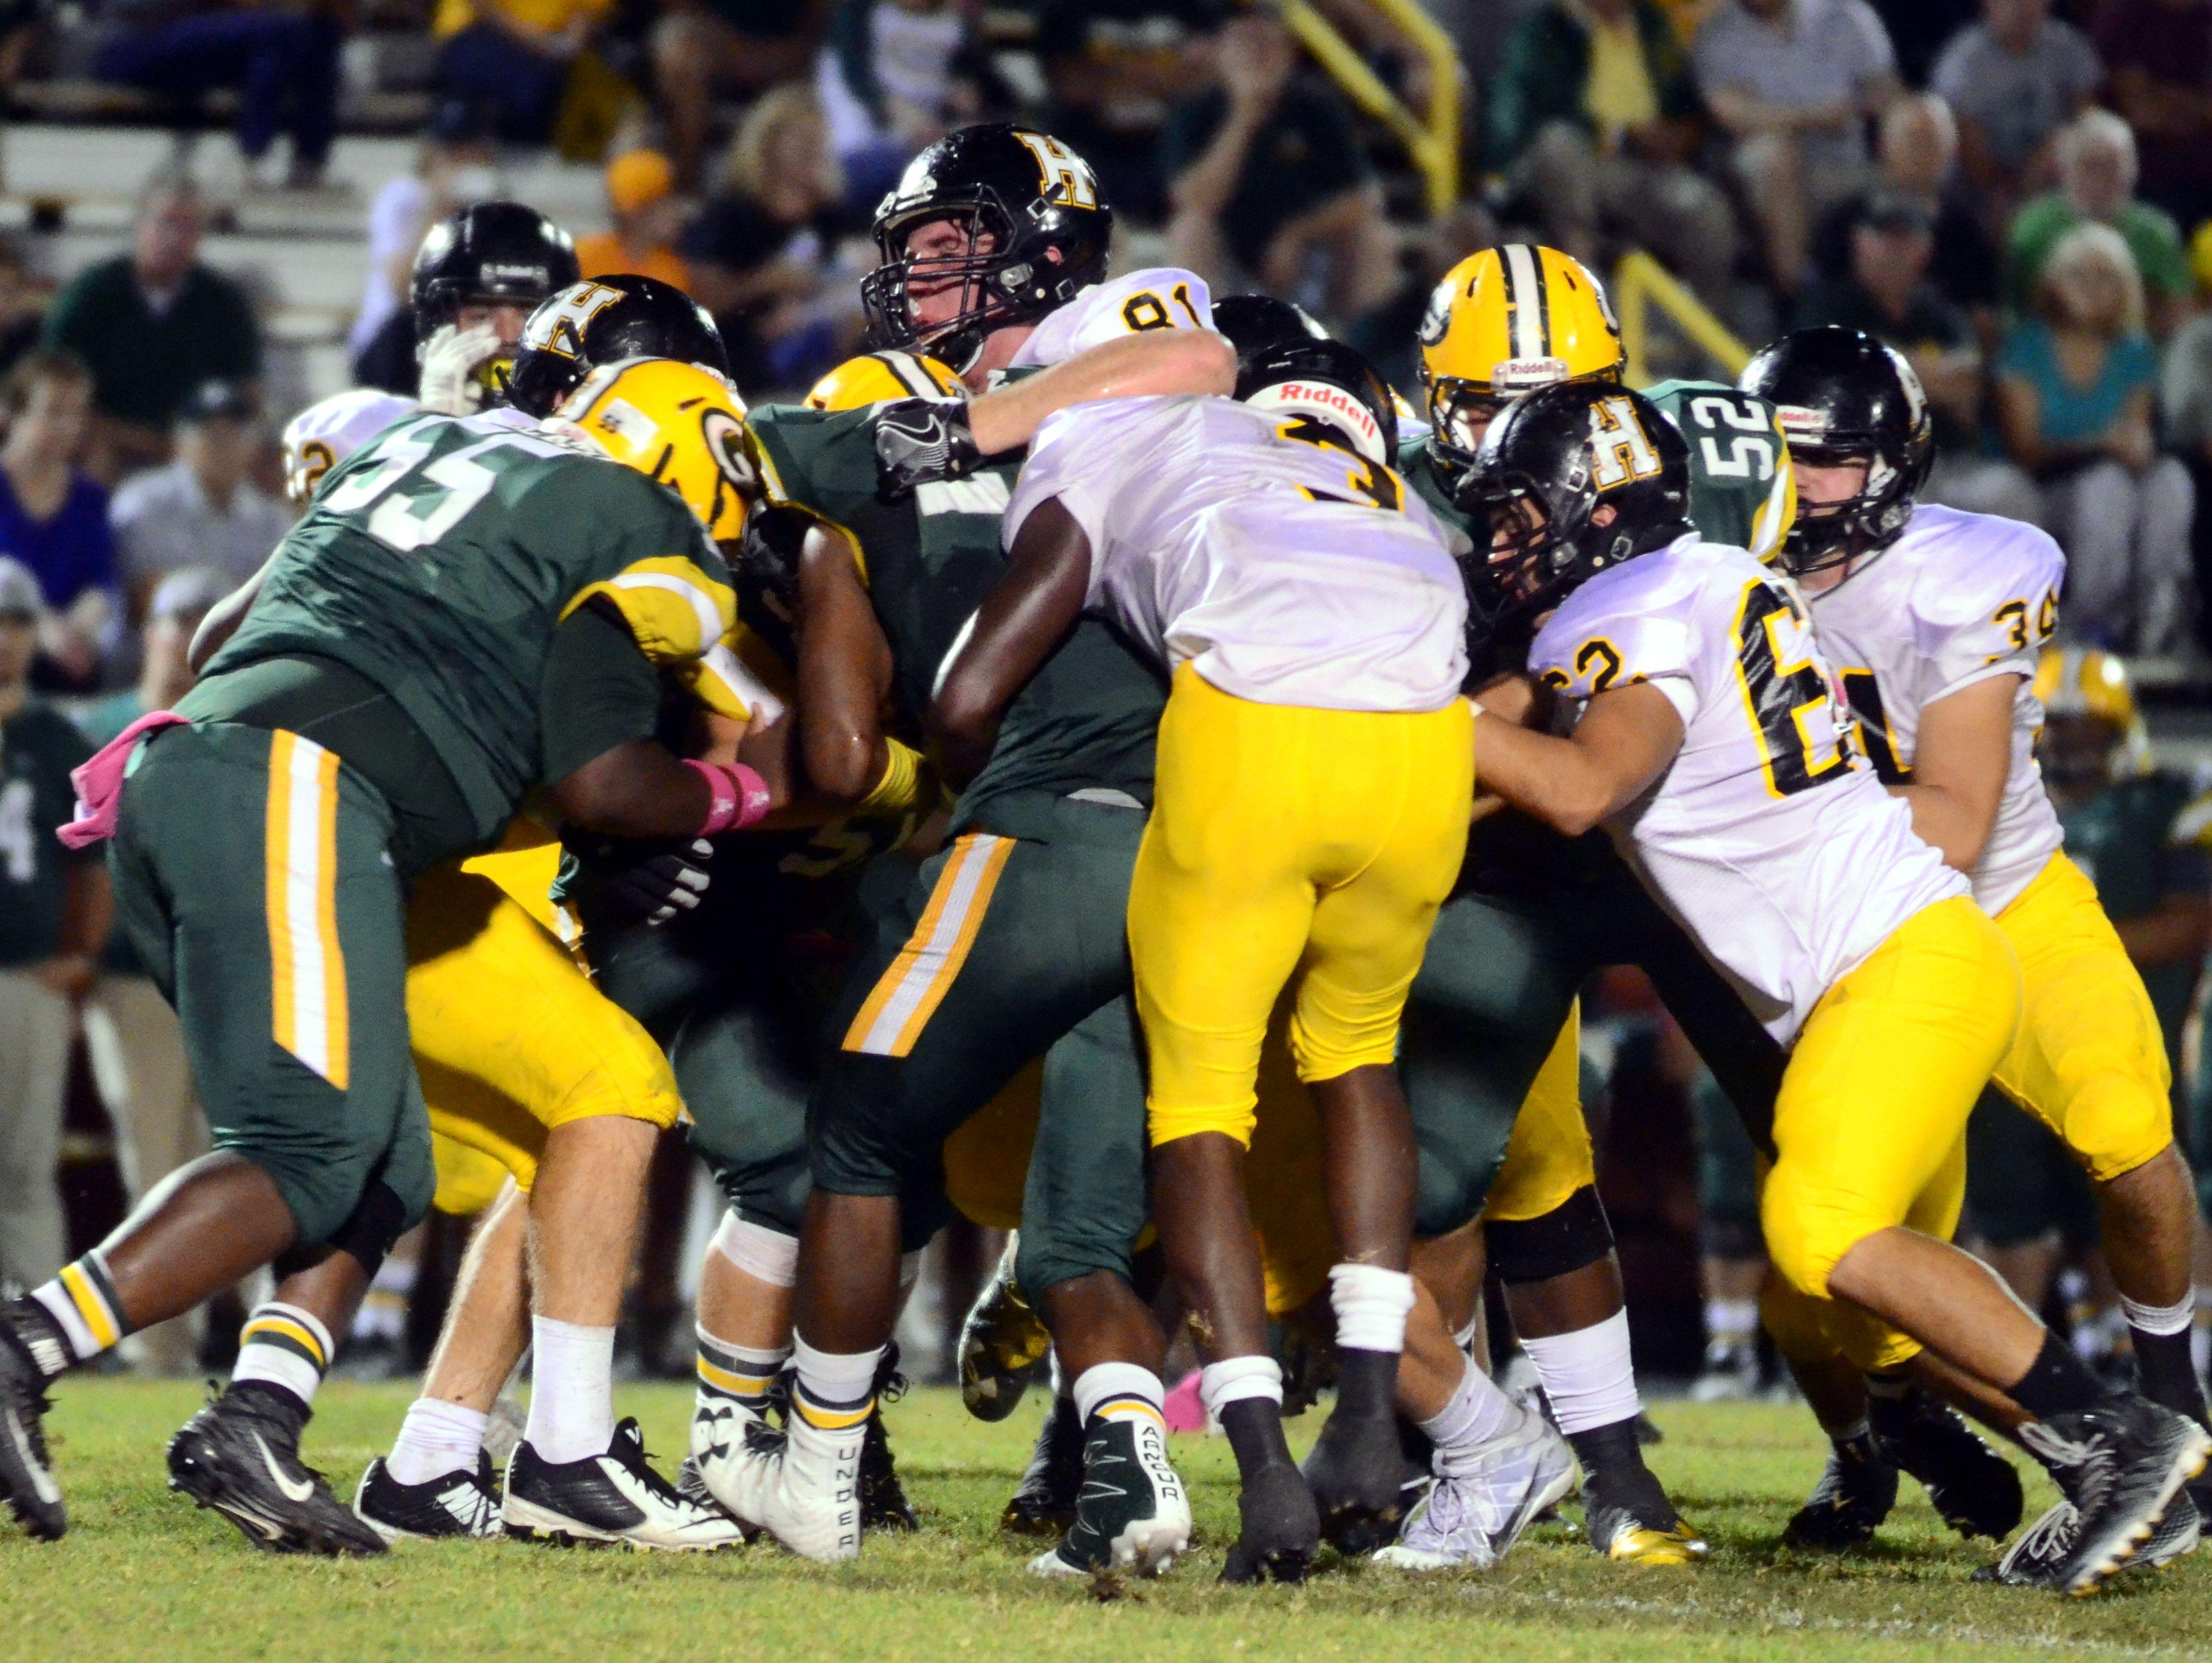 Hendersonville senior Jordan Amis (81) helps push the pile to tackle Gallatin senior Jordan Mason during Friday's game.